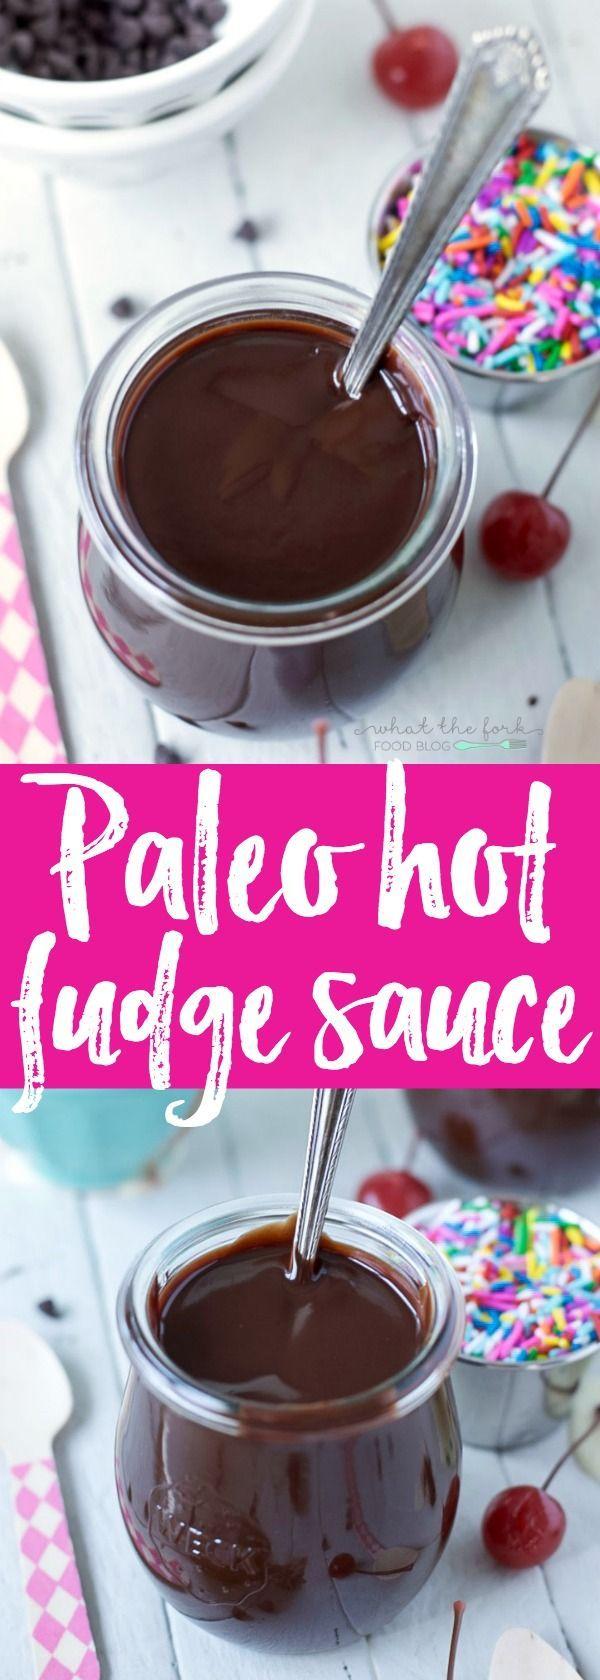 How to make Paleo Hot Fudge Sauce - What the Fork | Recipe ...